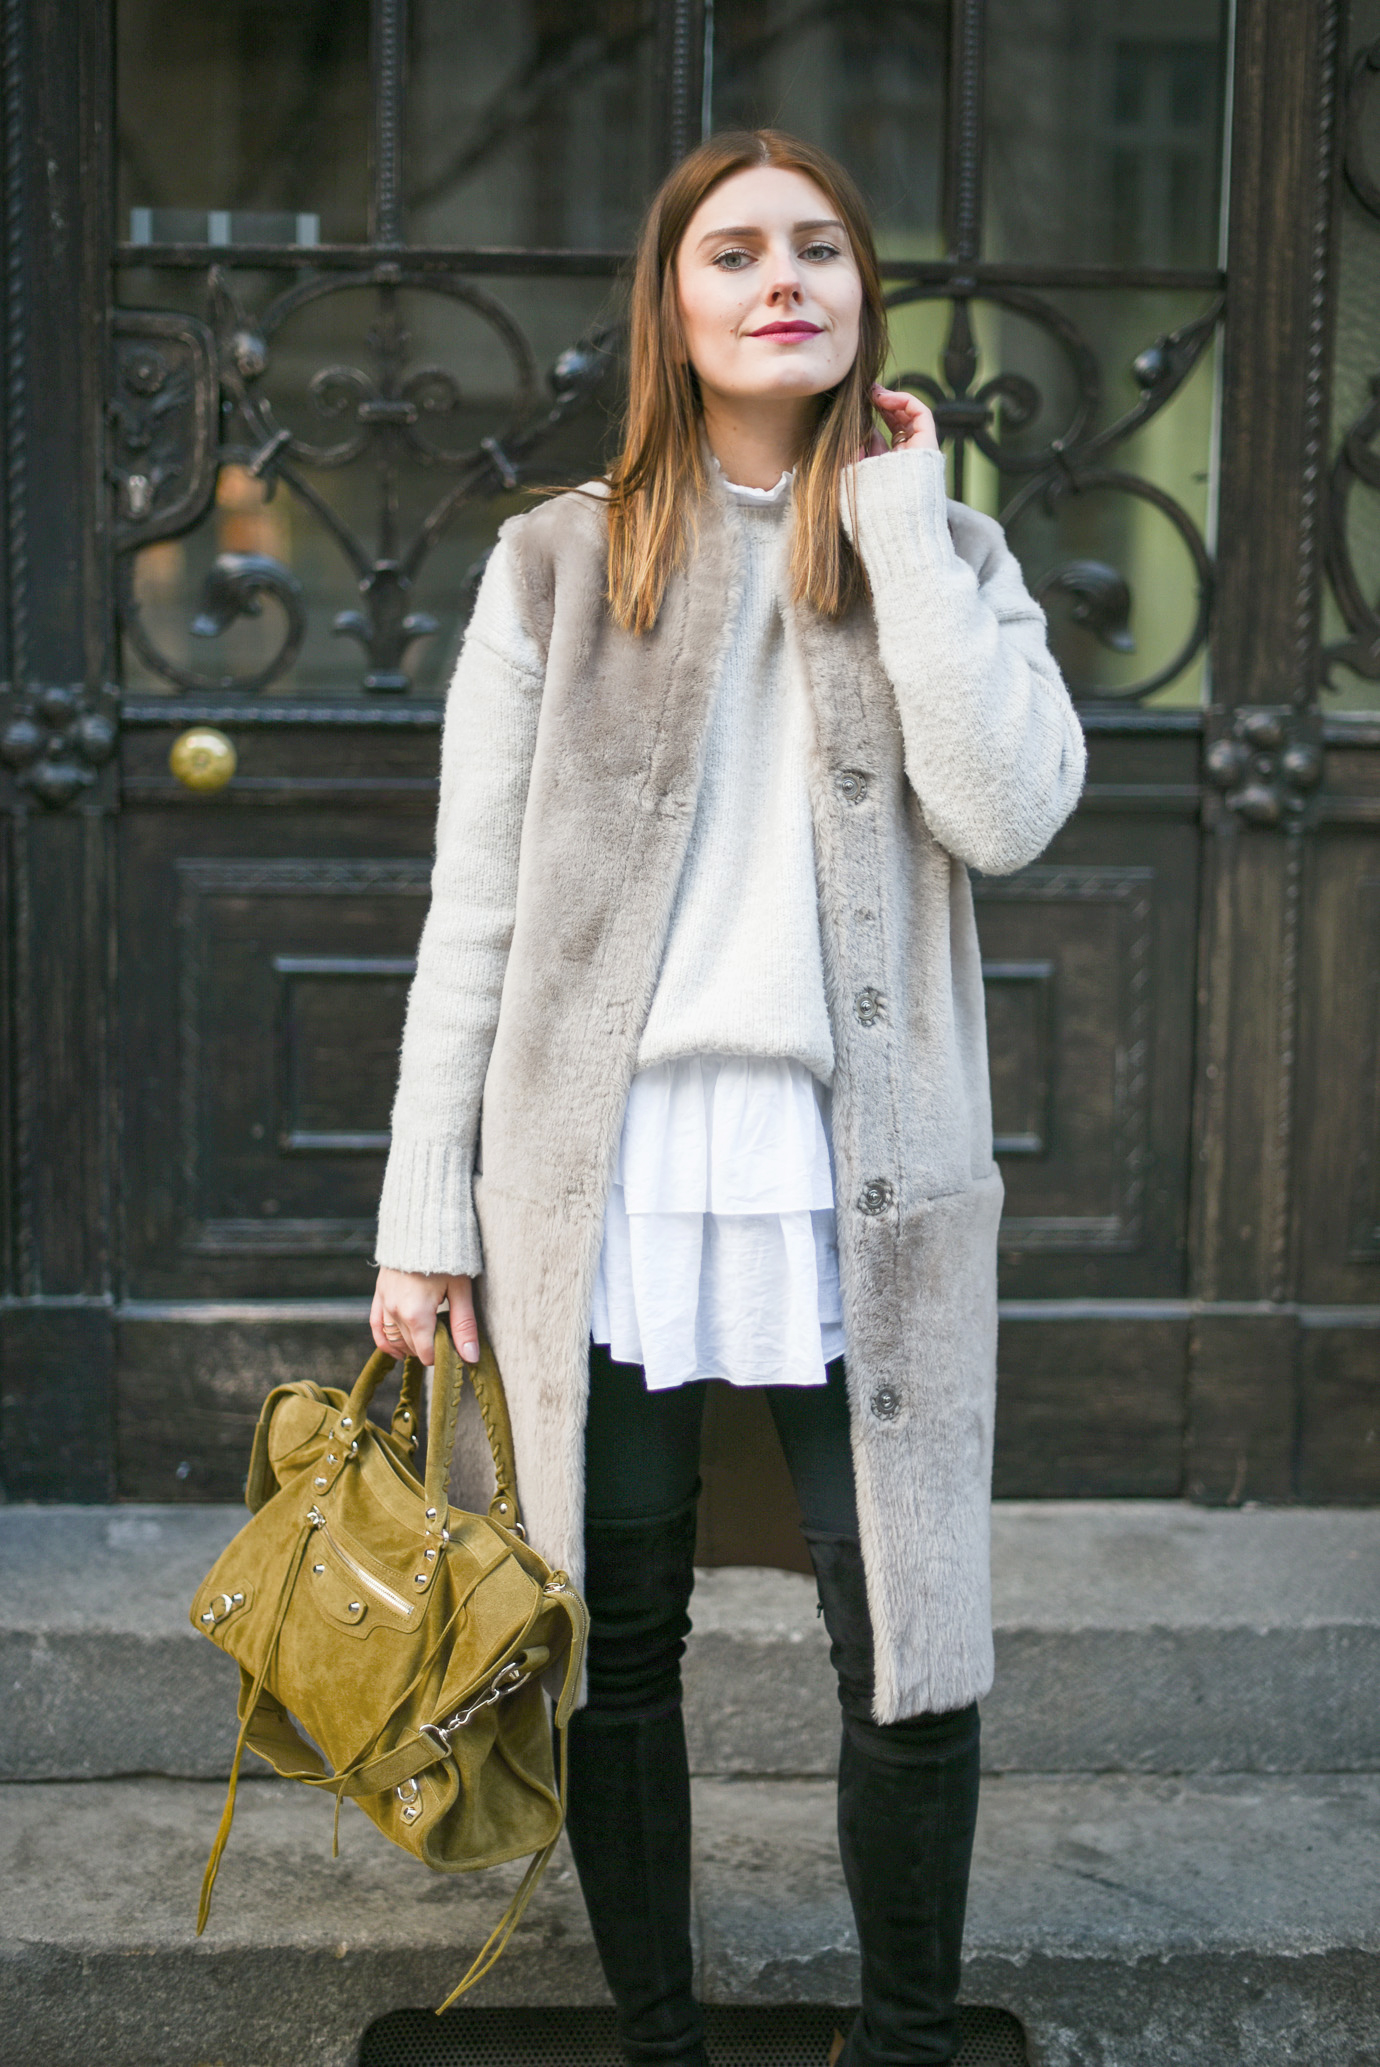 Berlin_Fashion_Week_Outfit_5